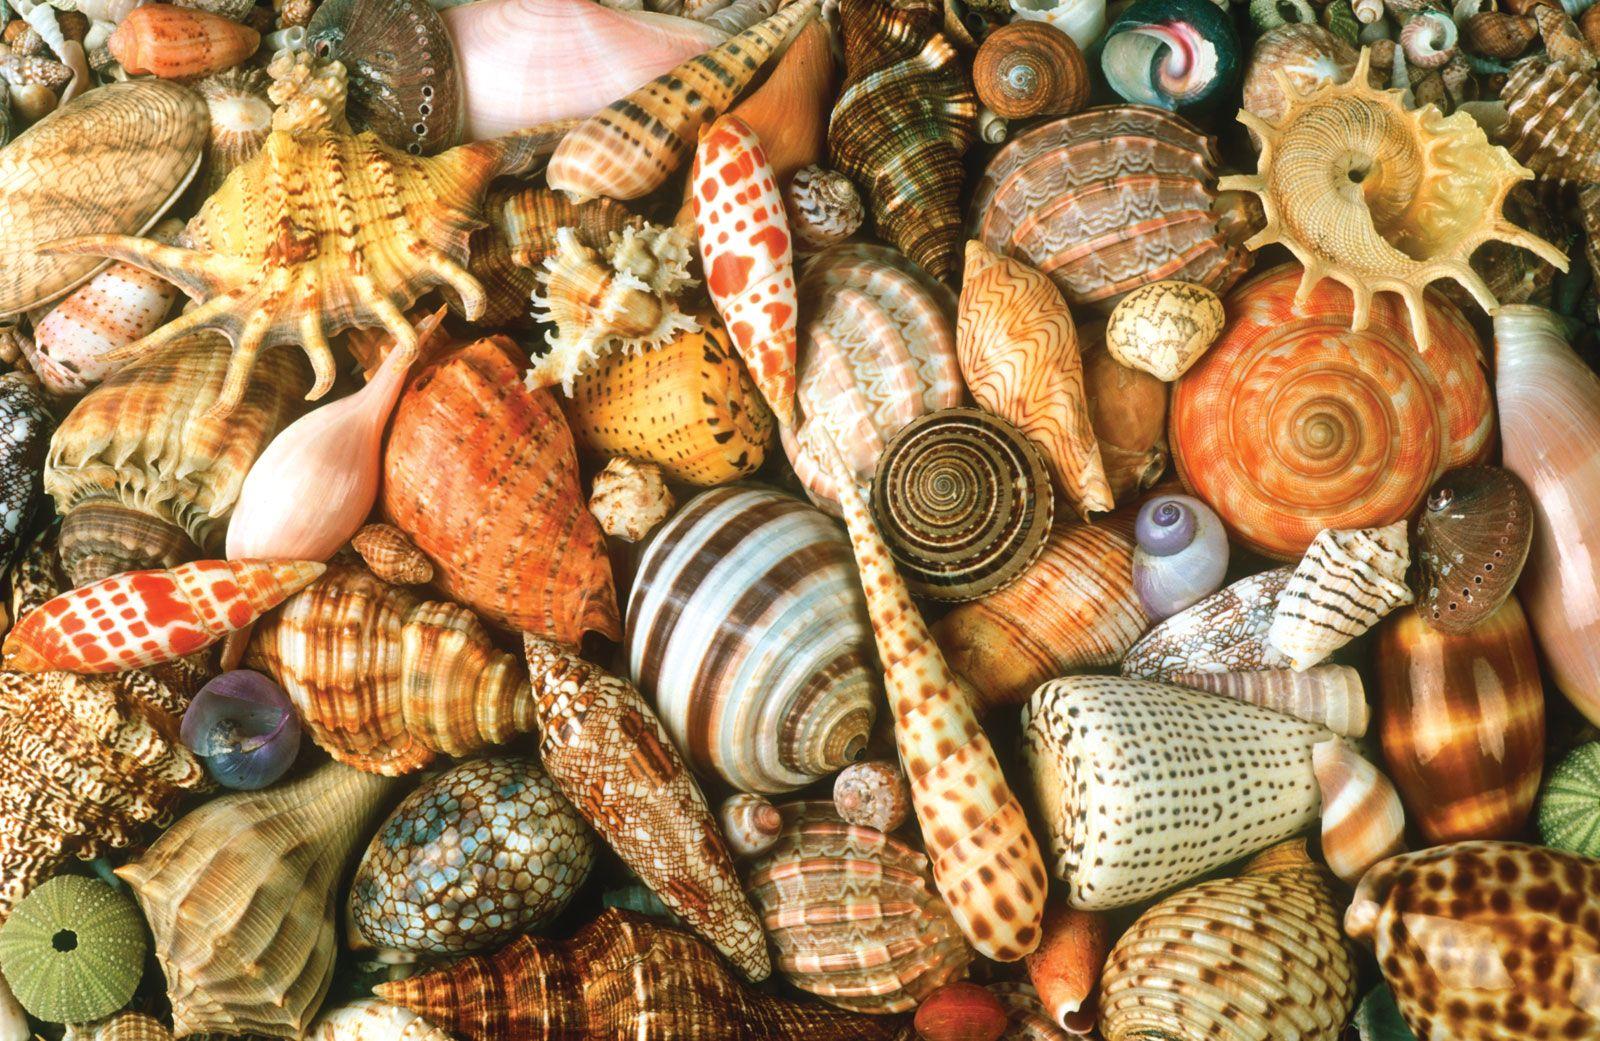 a magia do mar #3: usando as conchas | mosaics